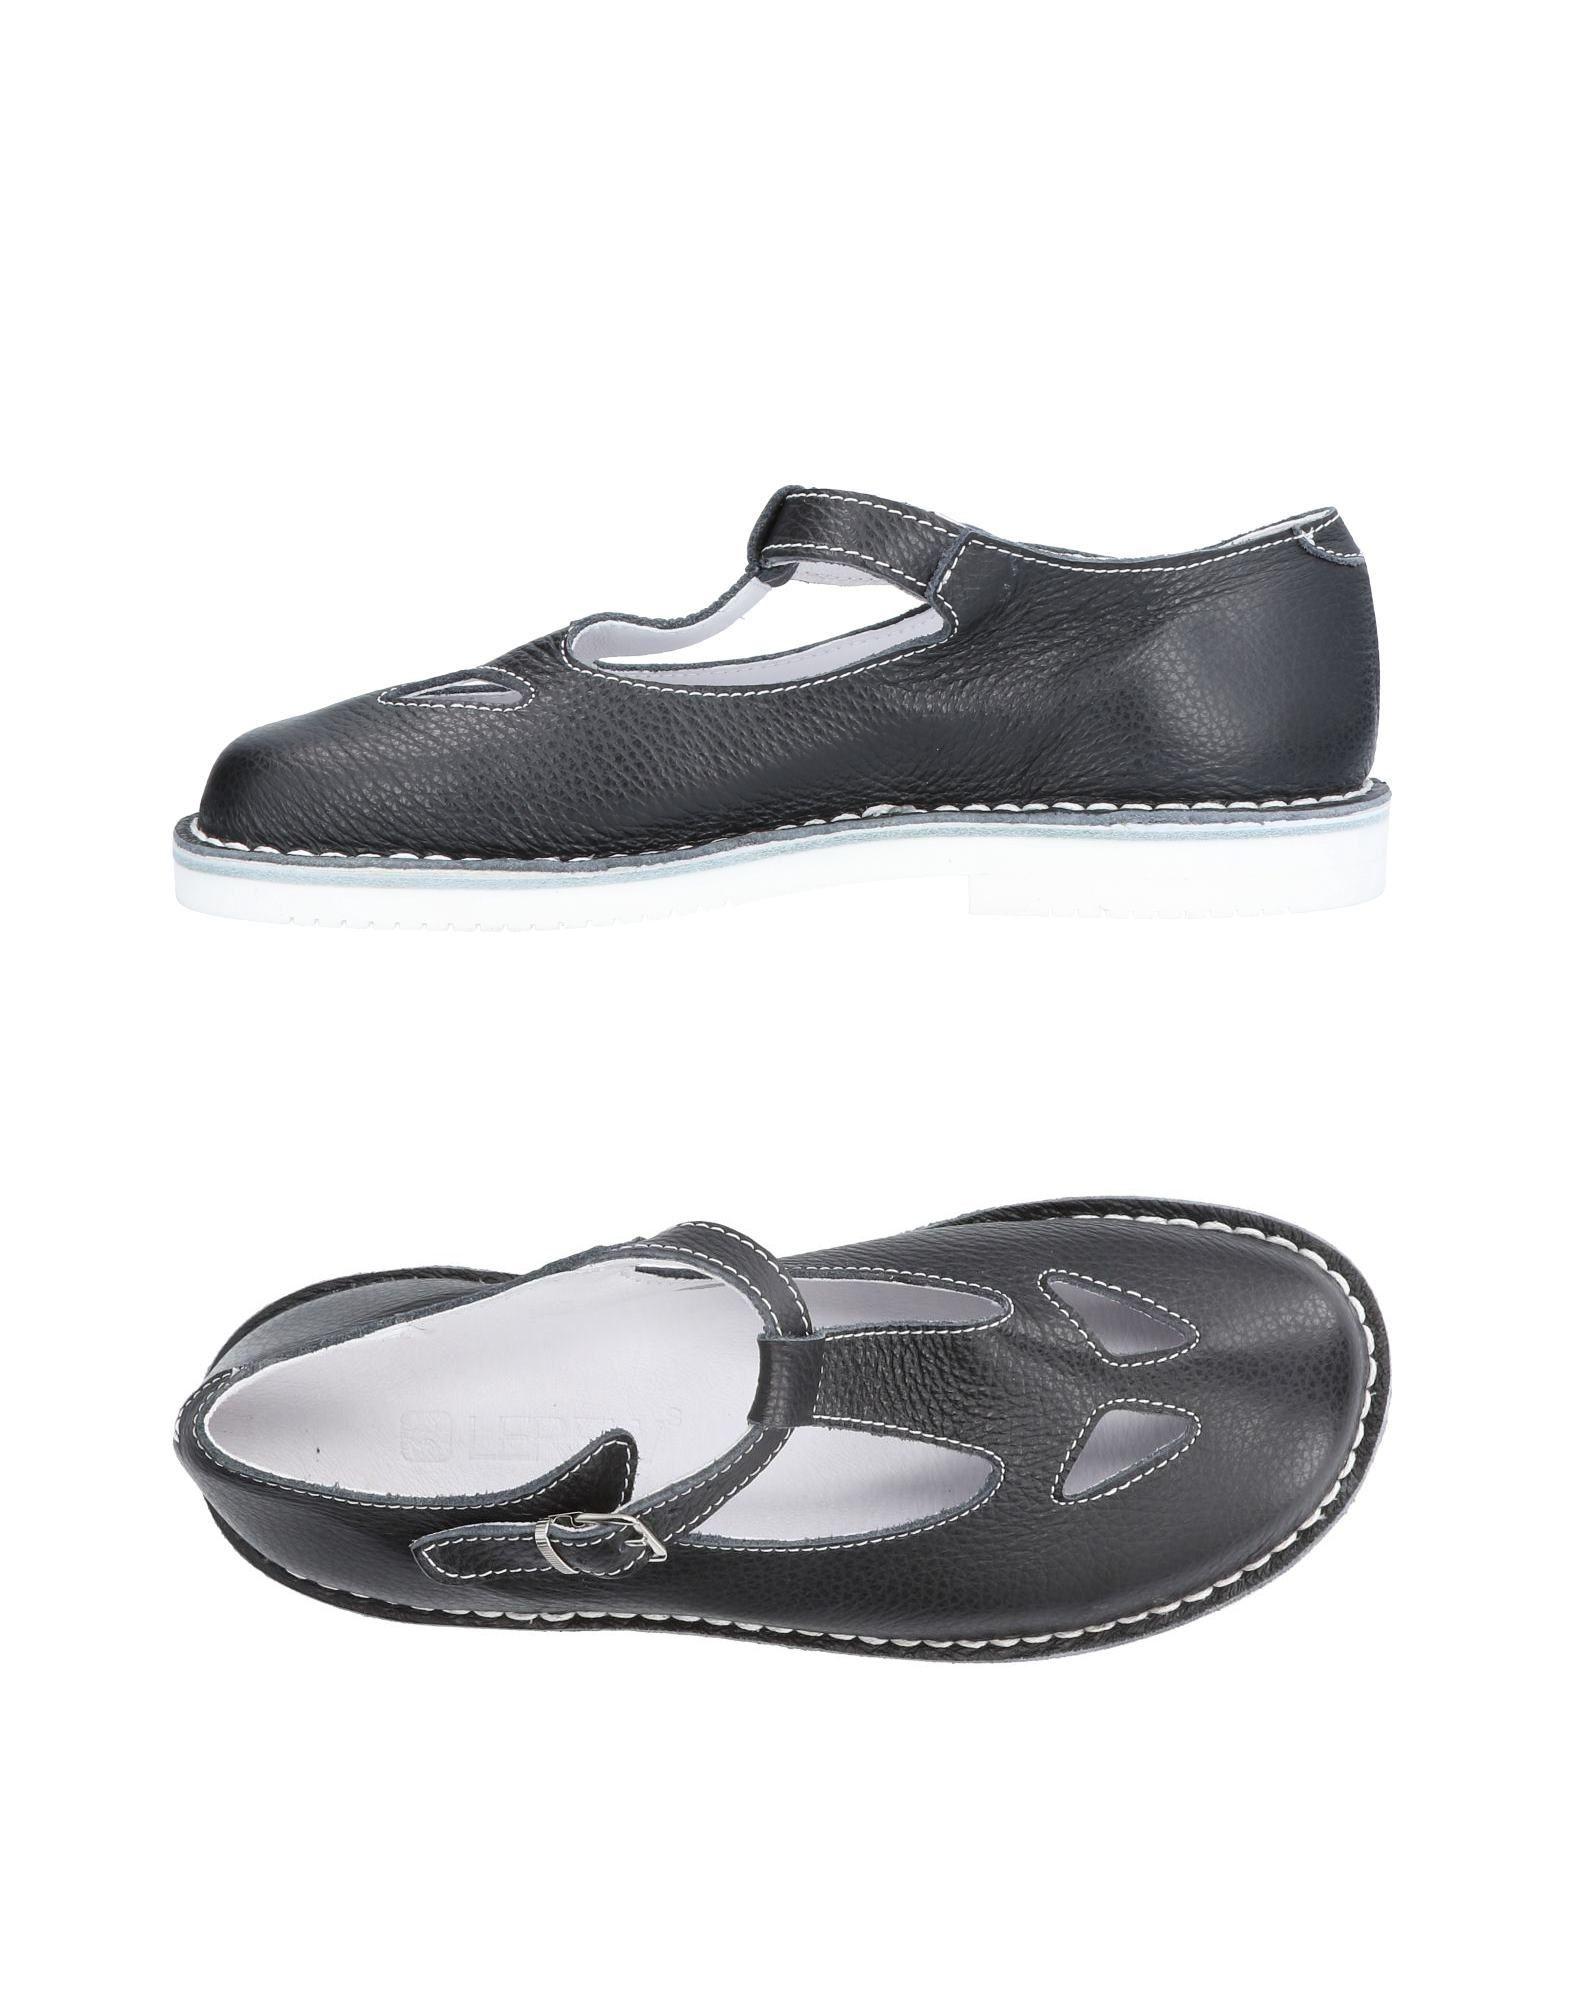 LEREWS - Κορυφαία προϊόντα για ολοκληρωμένα Outfit  7d44d8a63b7